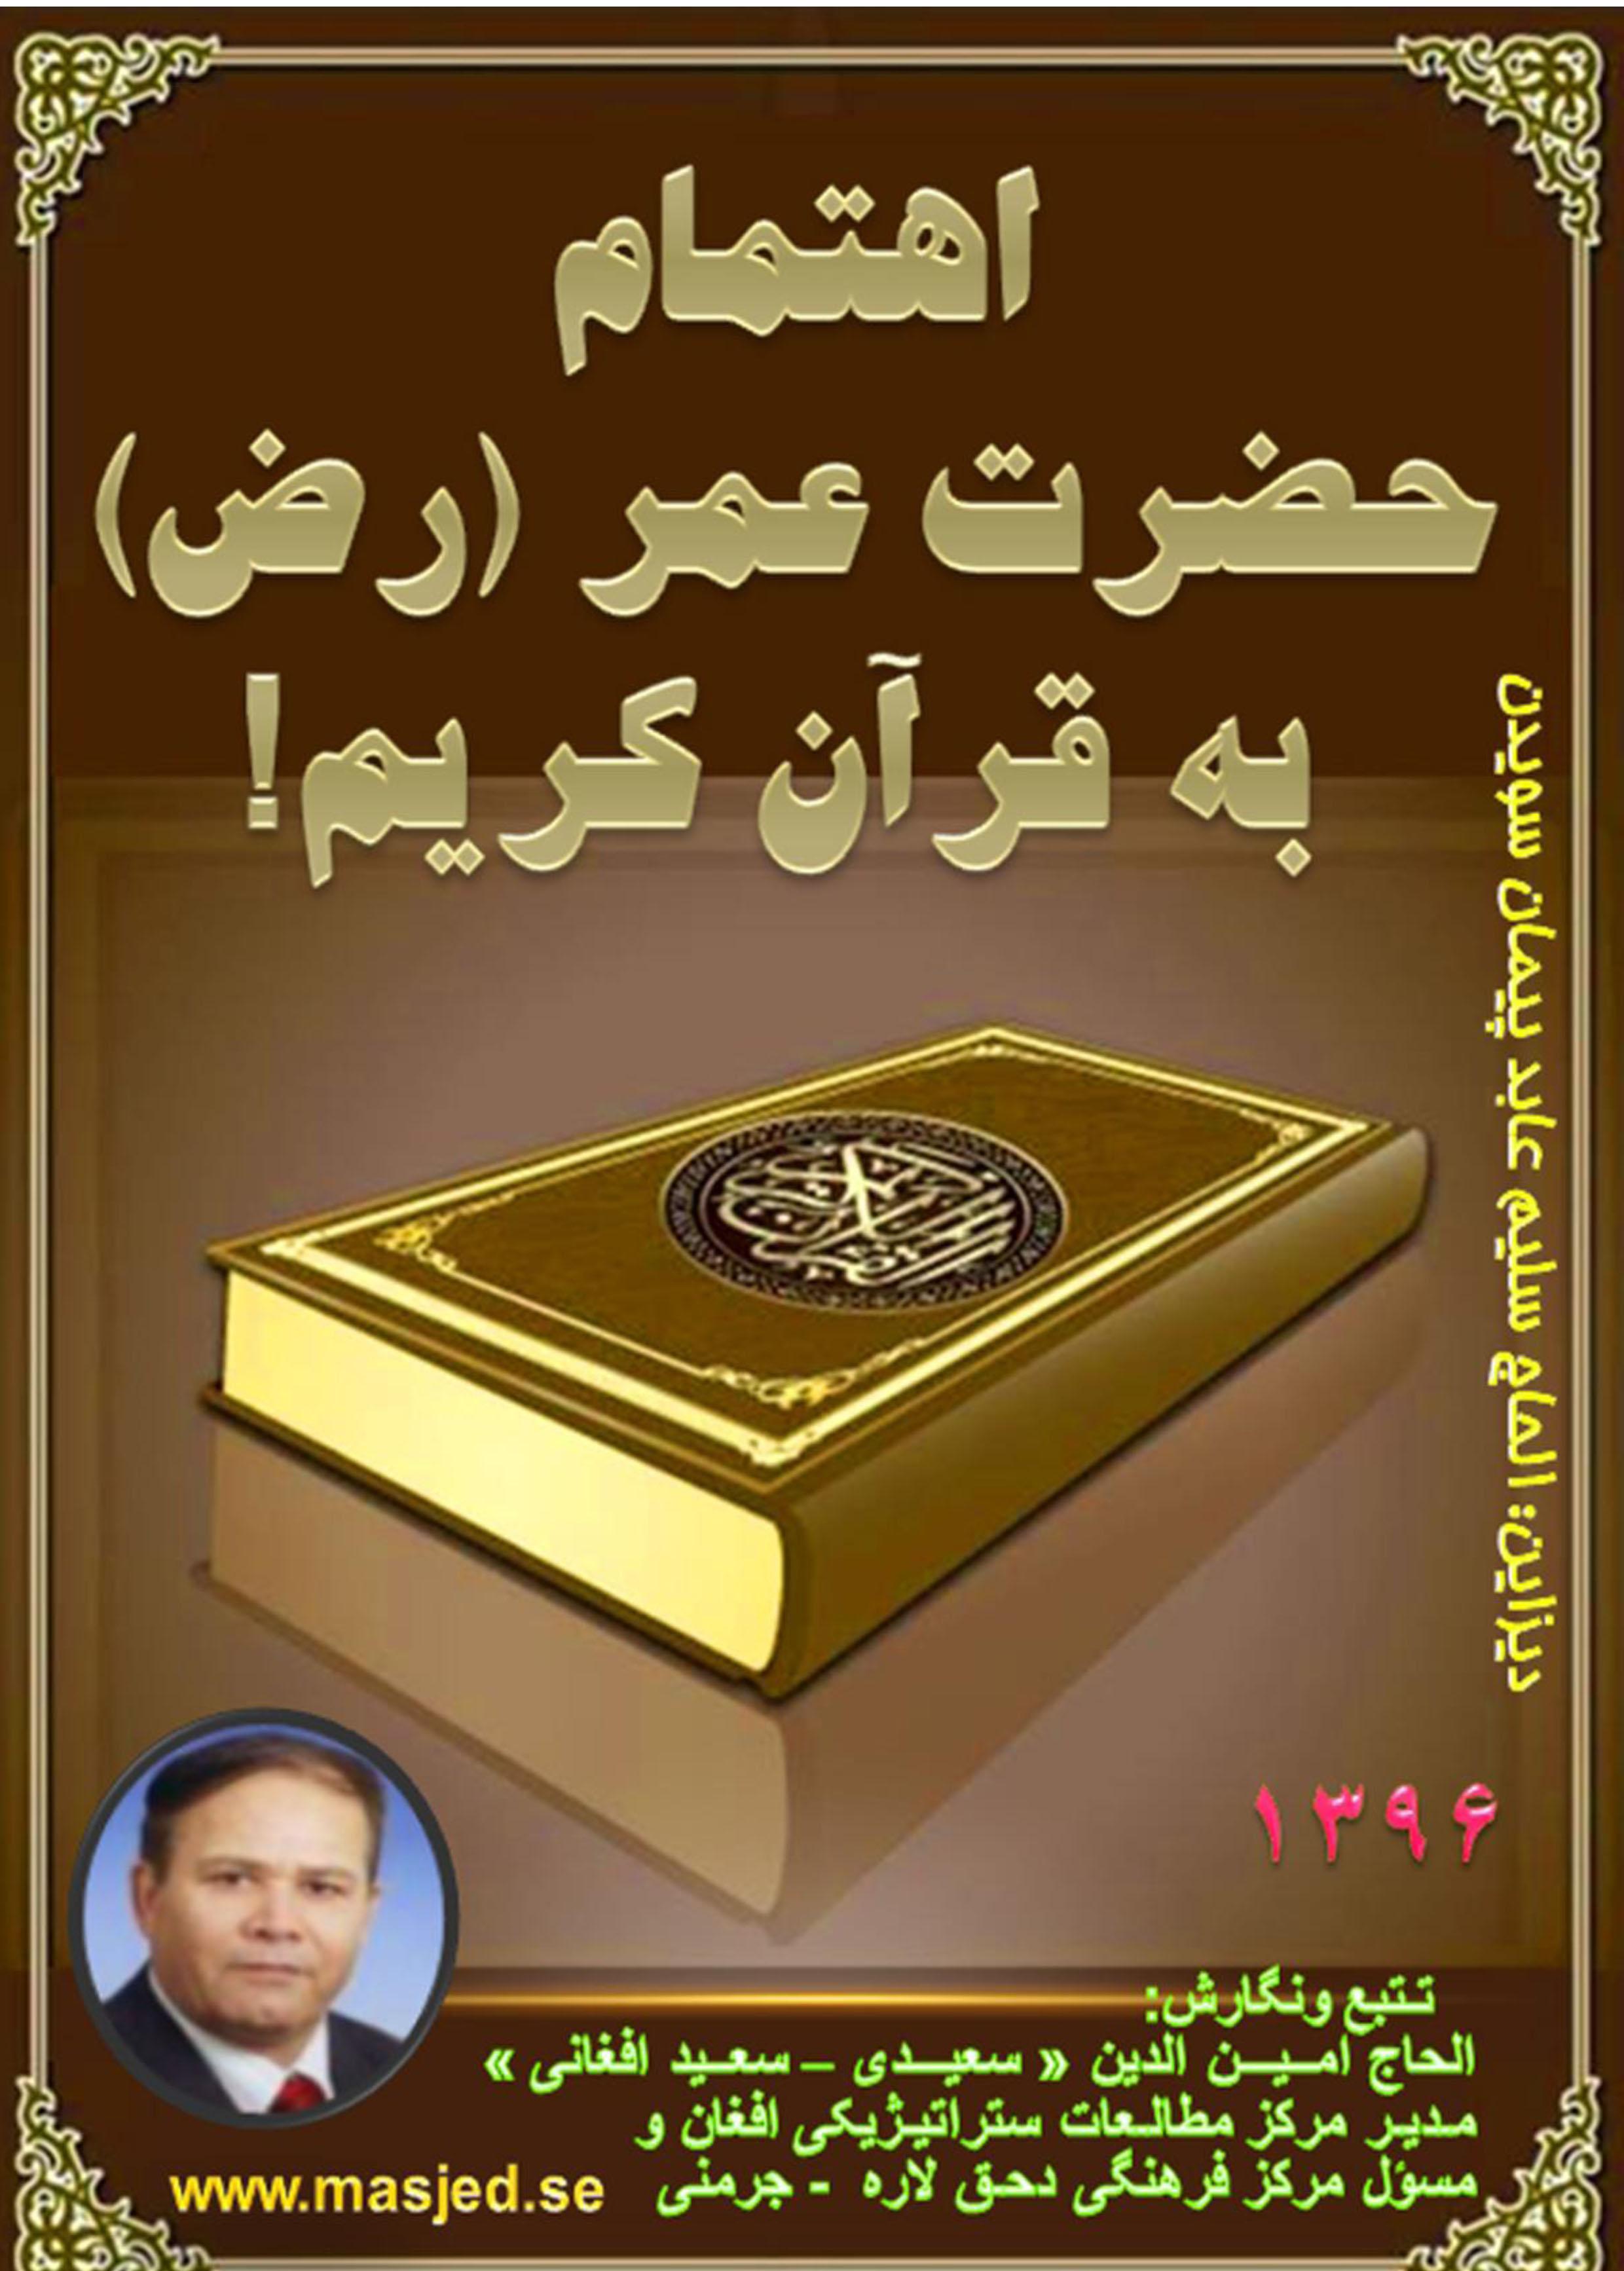 اهتمام  حضرت عمر (رض) به قرآن کریم!